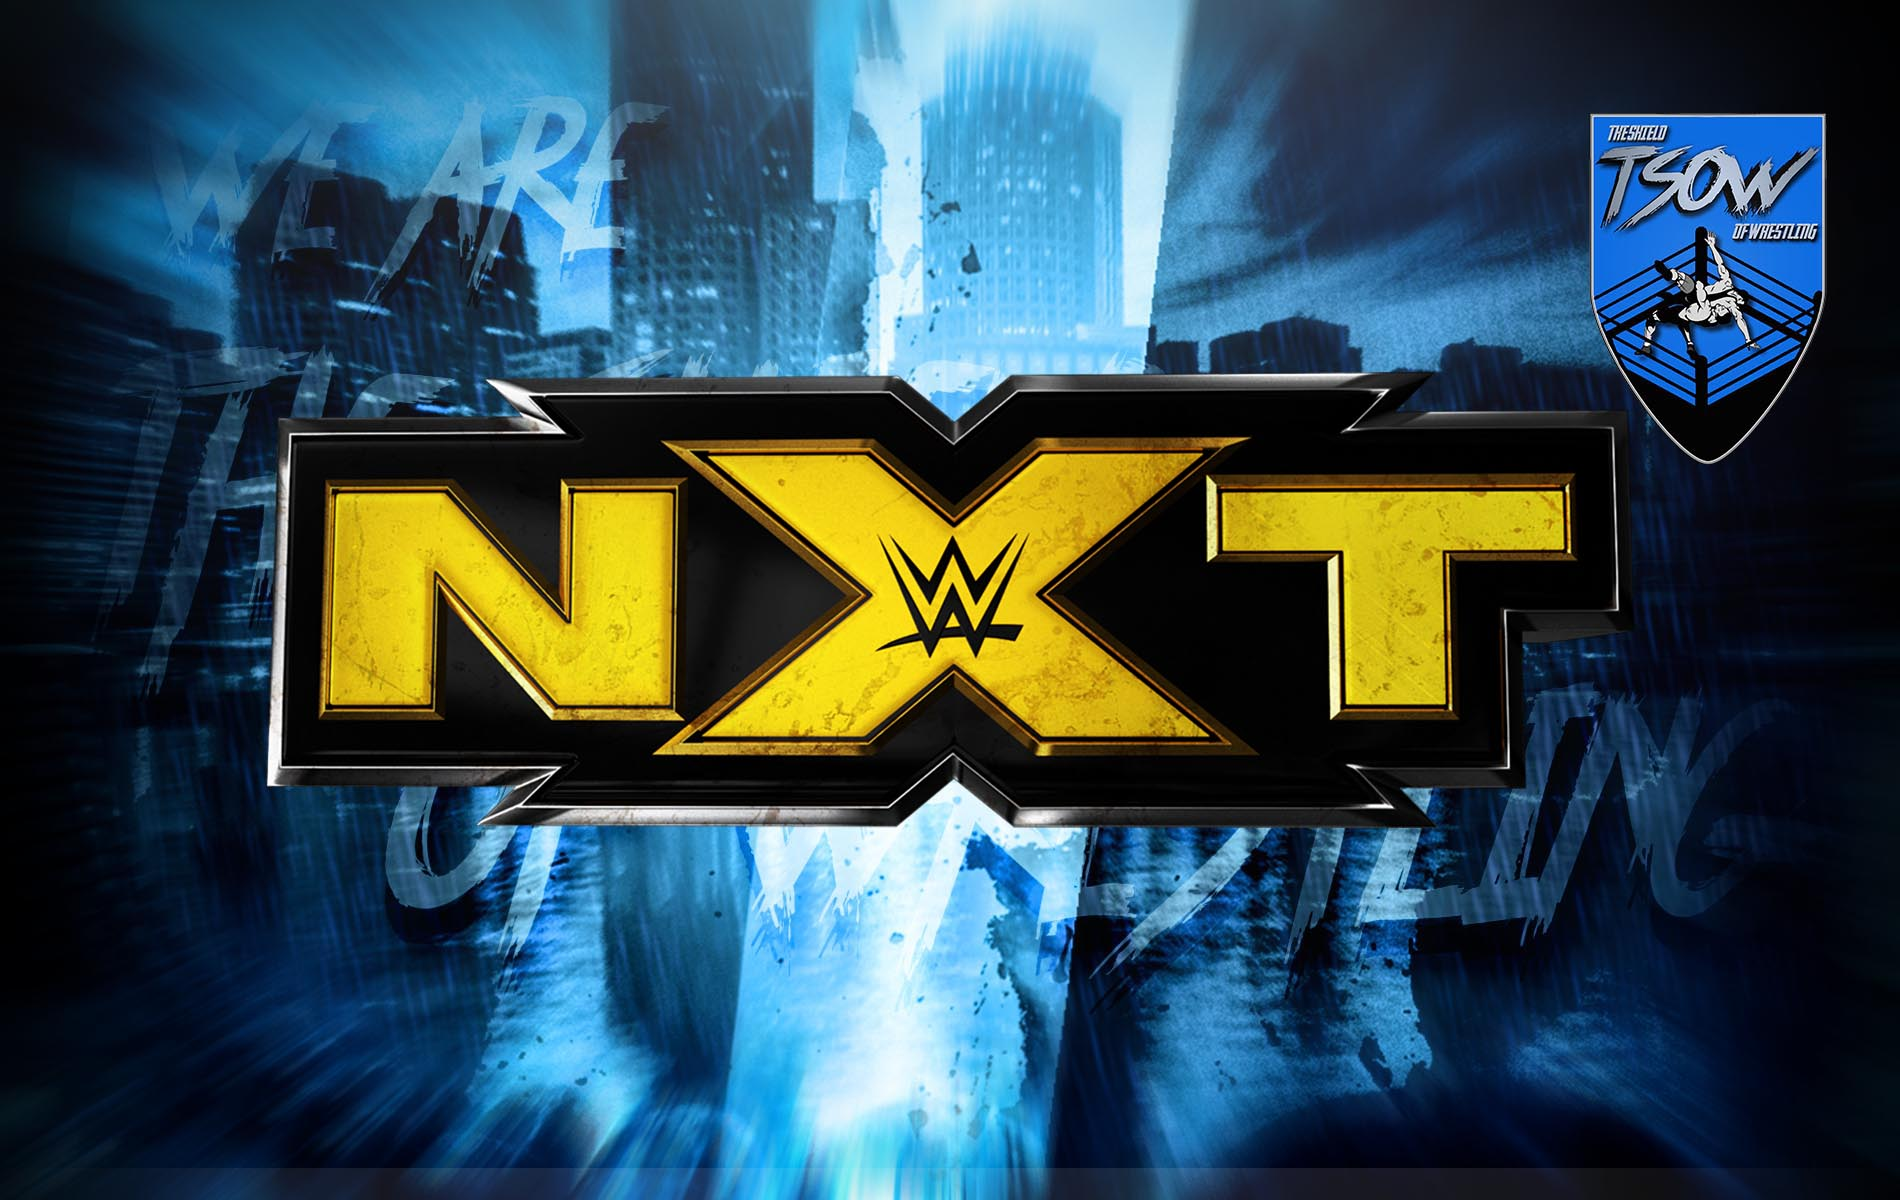 Karrion Kross vs Austin Theory: chi ha vinto ad NXT?